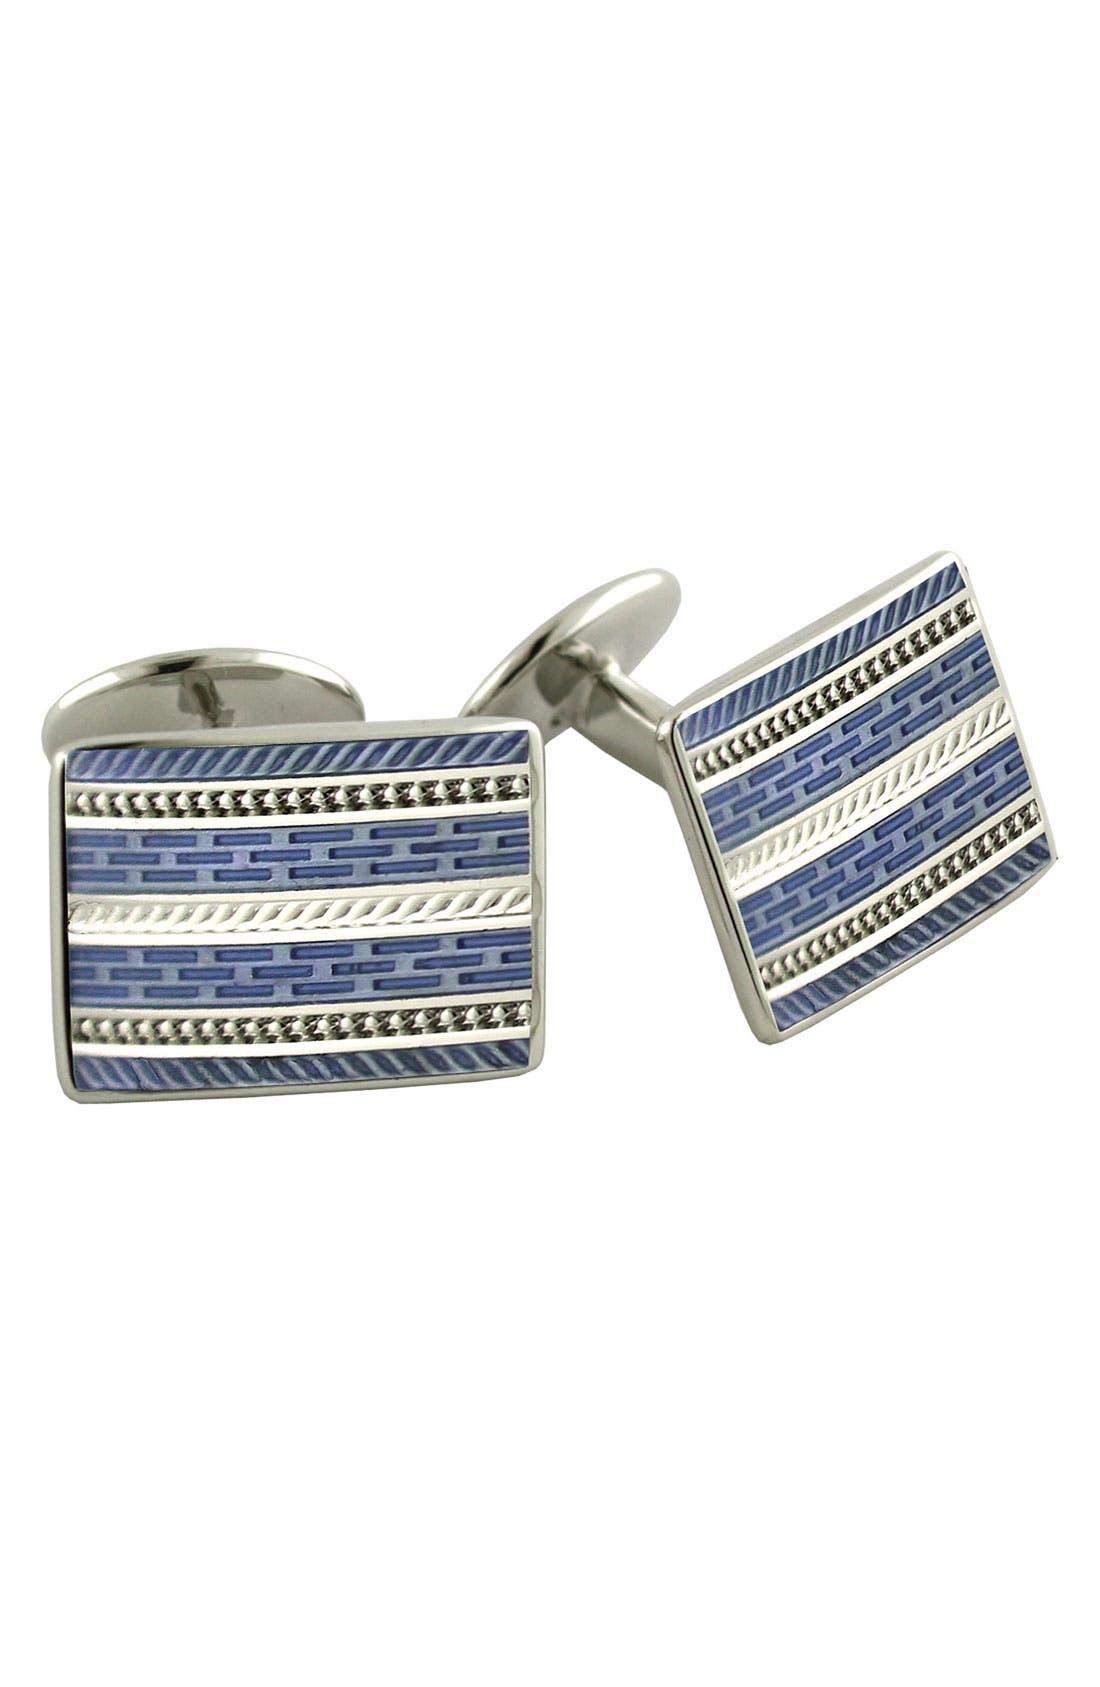 Main Image - David Donahue 'Blue' Rectangular Sterling Silver Cuff Links